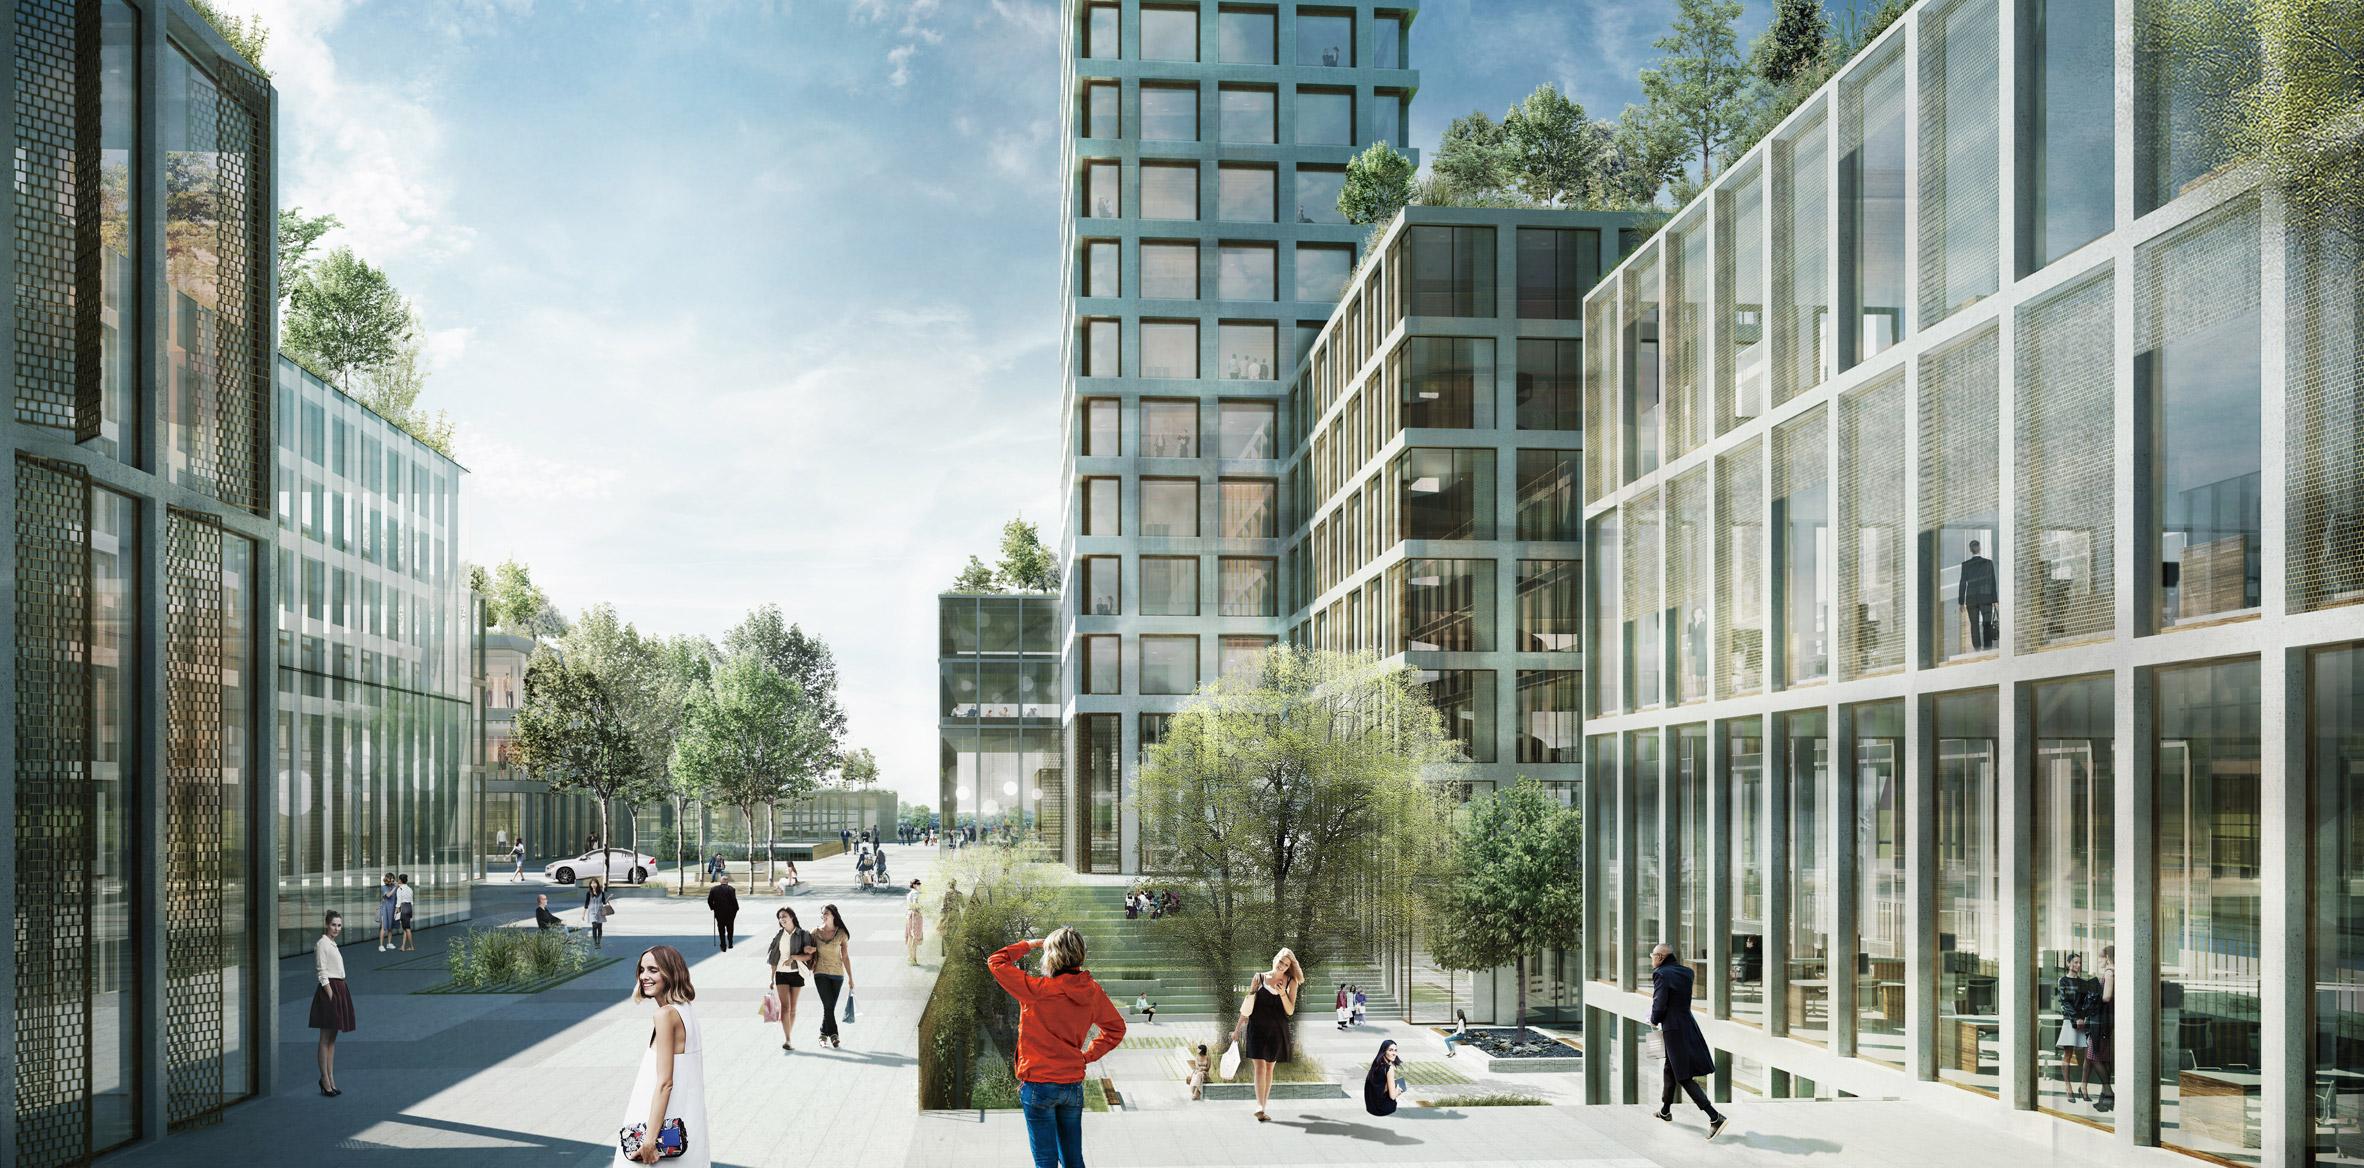 Dorte Mandrup designs Bestseller Tower, the tallest building in Western Europe